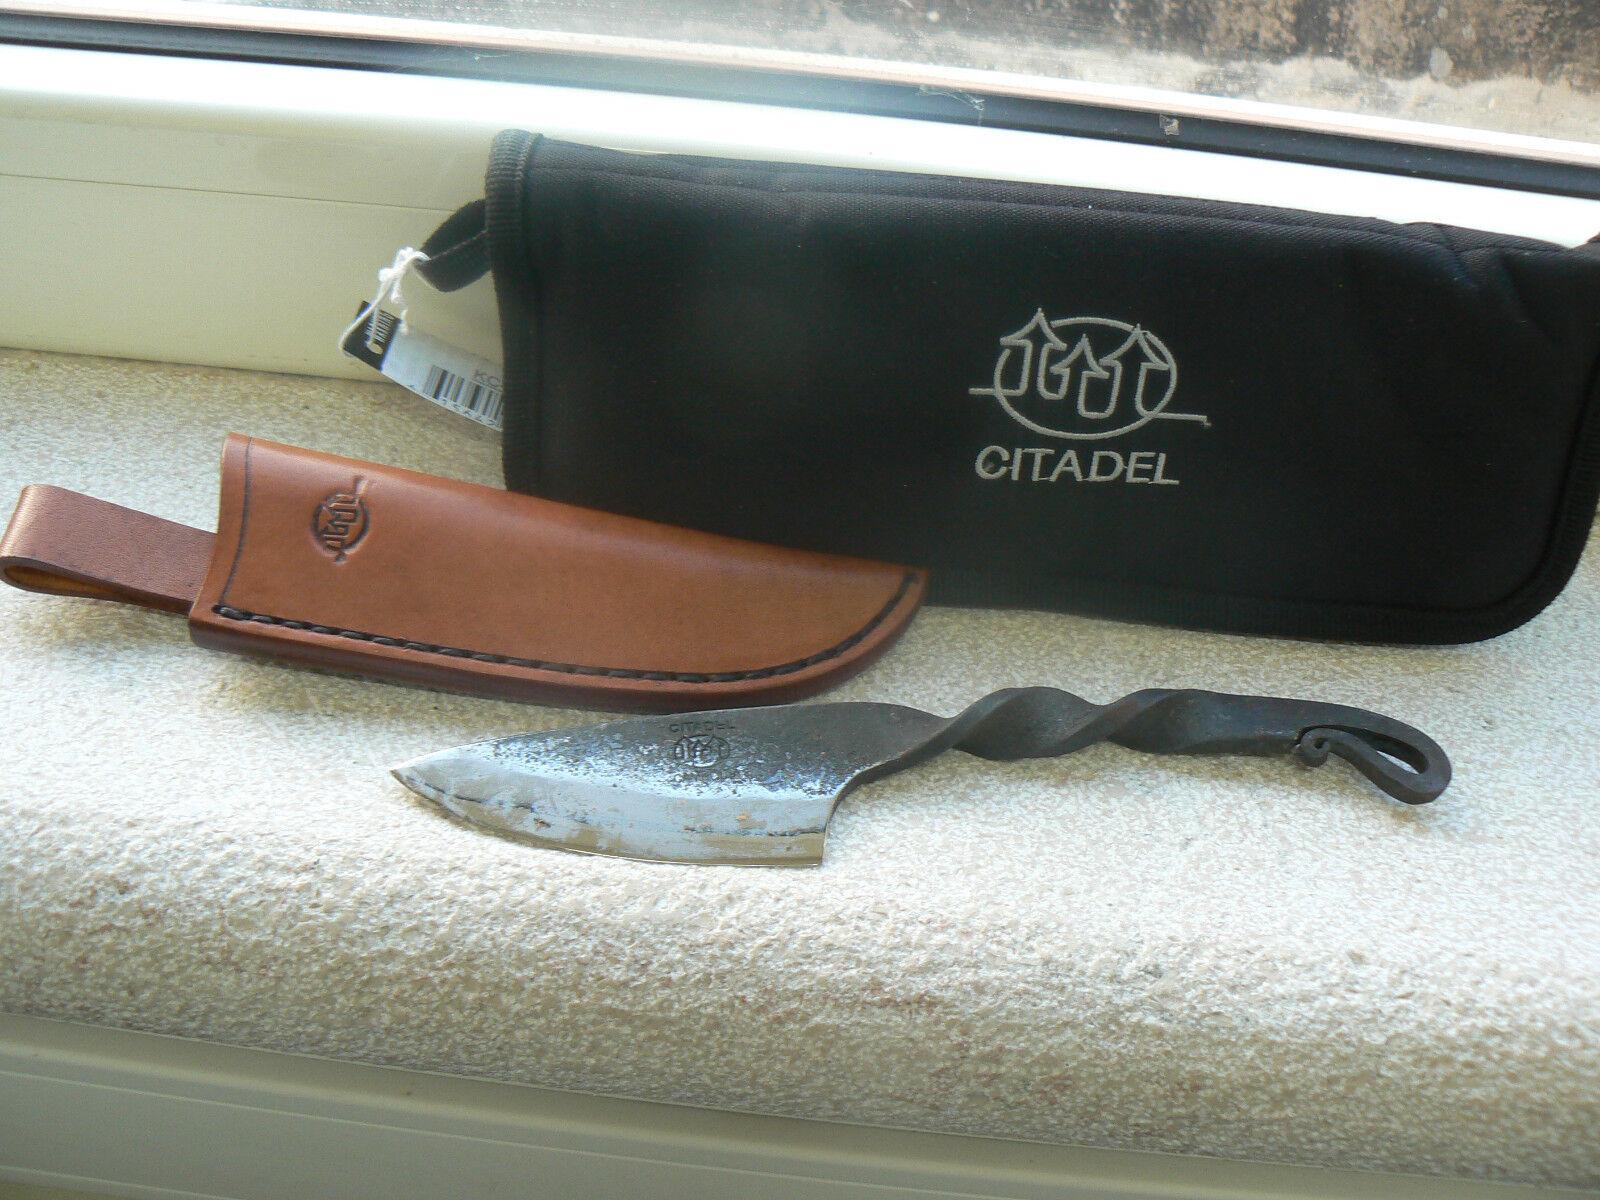 Coltello Citadel CD4207 Twisted Big knife messer couteau navaja